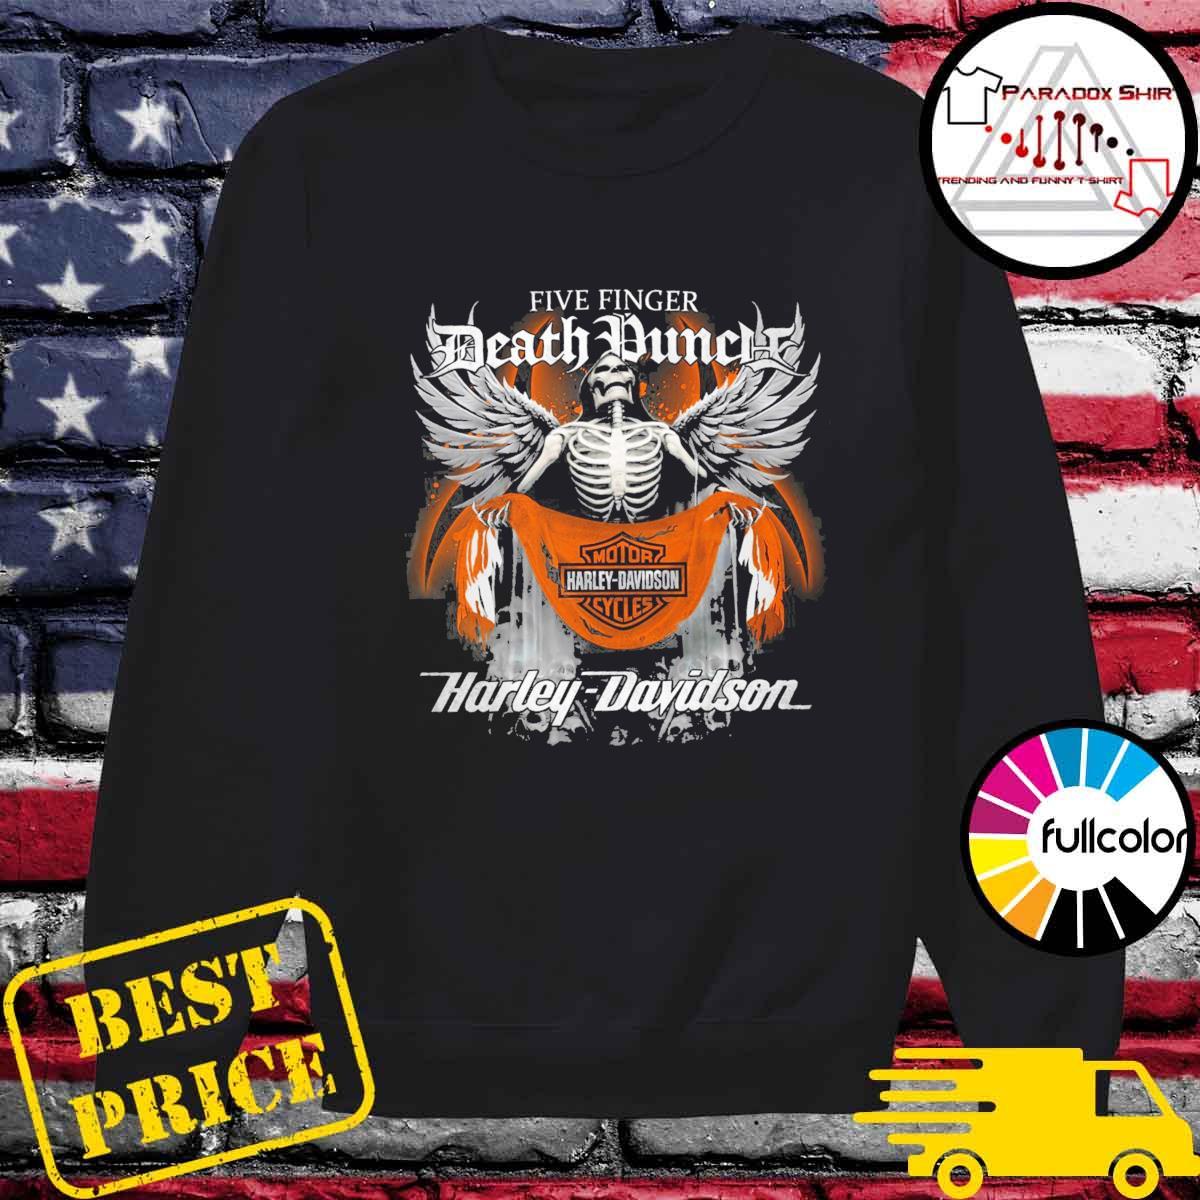 Five Finger Death Punch Motor harley Davidson Cycles Harley Davidson s Sweater